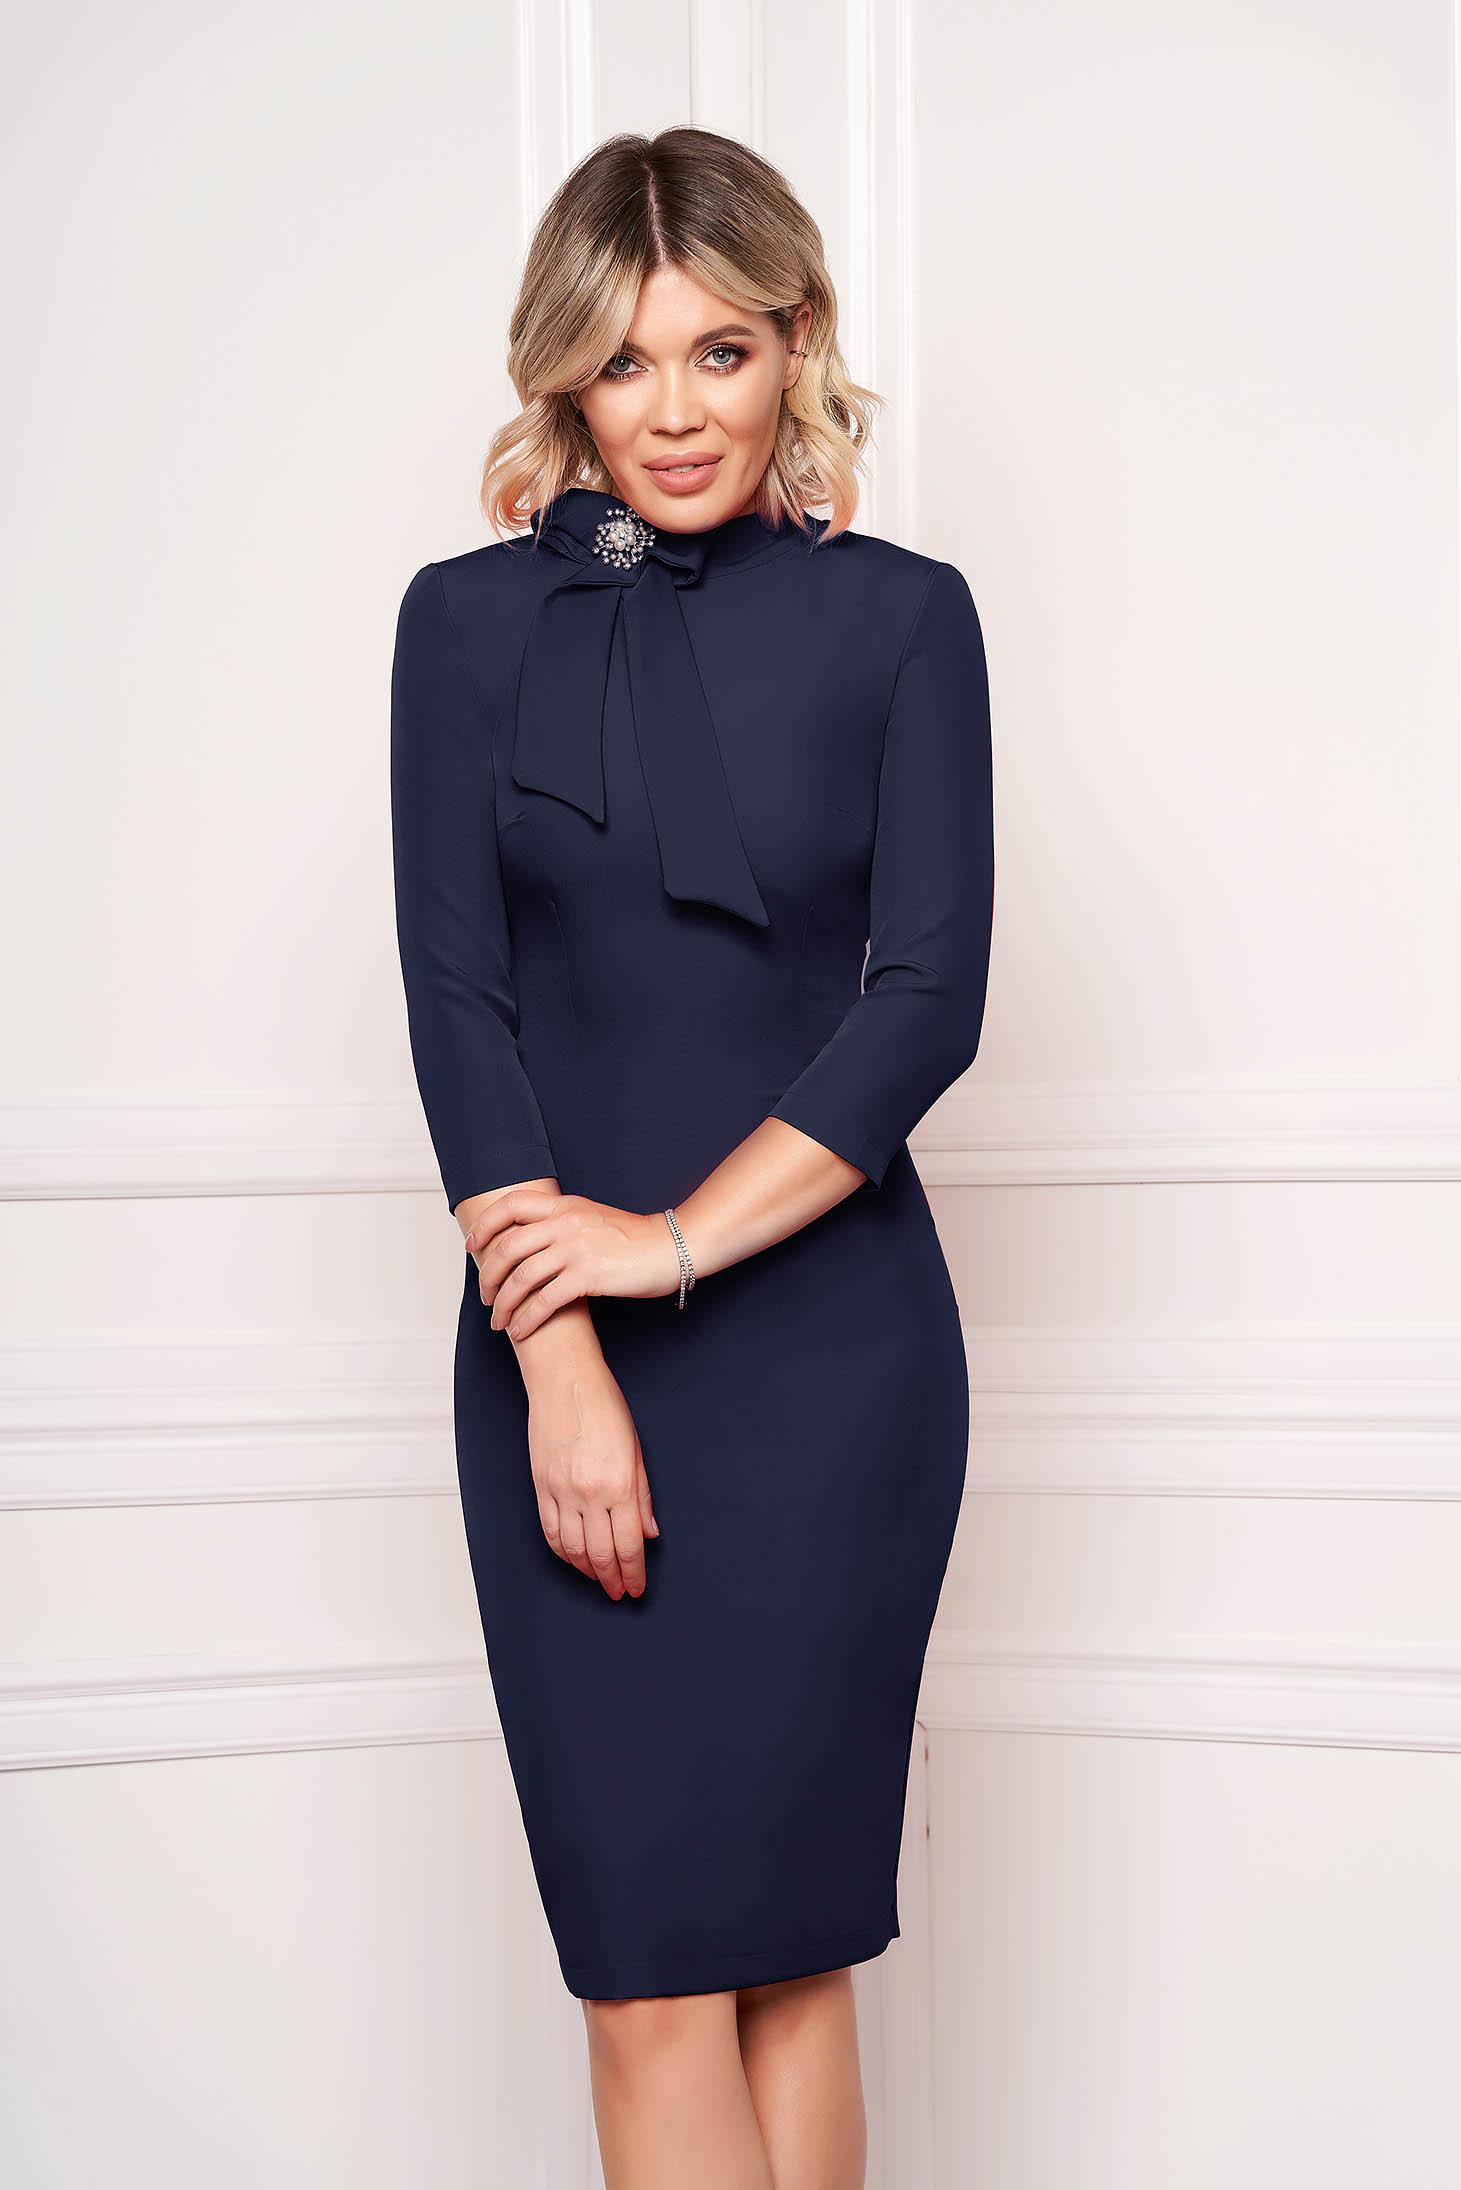 Rochie StarShinerS albastru-inchis eleganta office midi din stofa elastica accesorizata cu brosa la gat